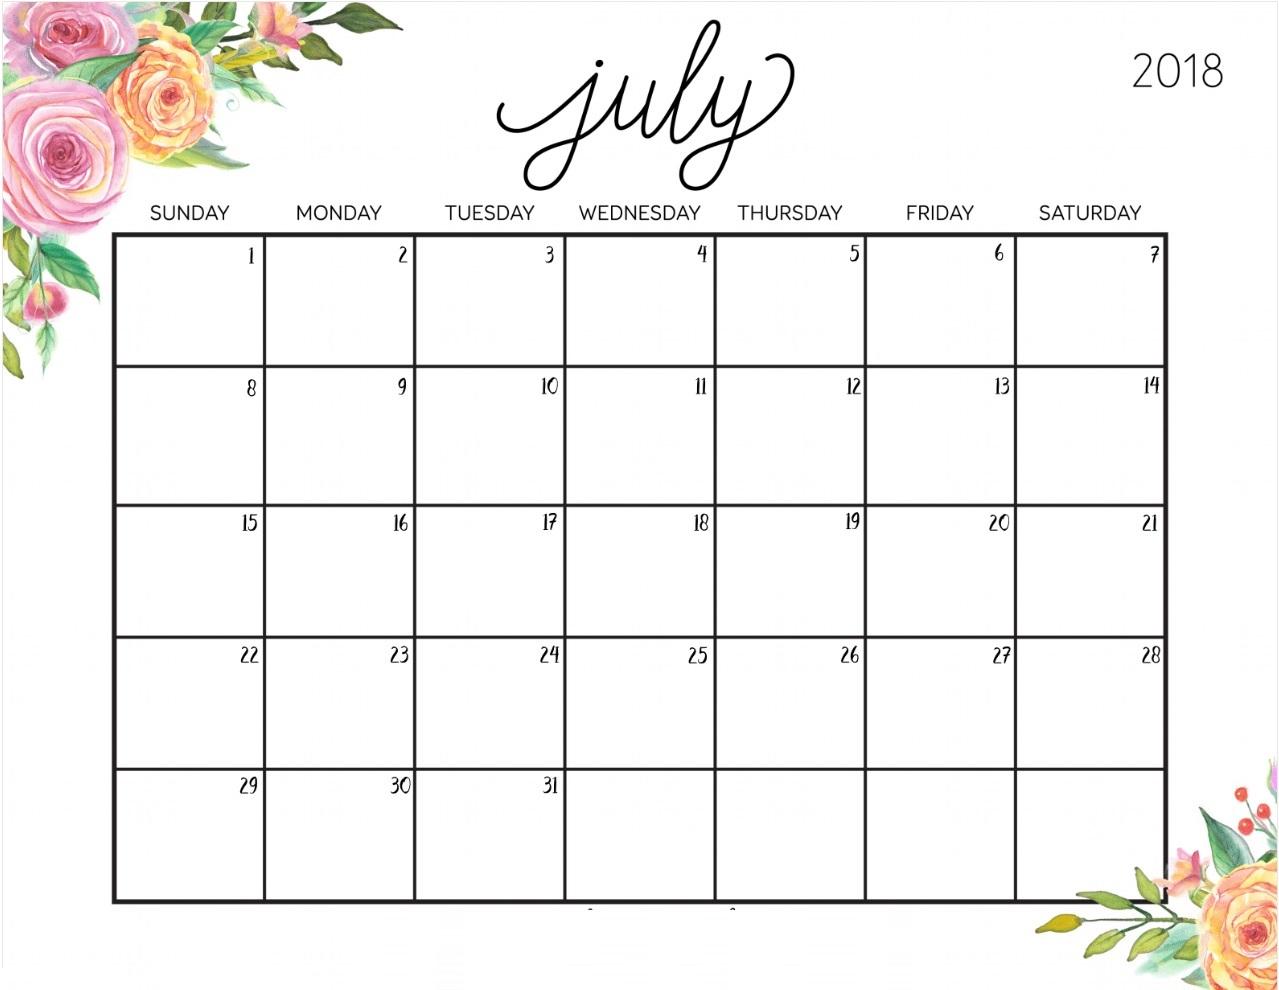 Blank Calendar July 2018 Printable Template Download - July 2019 inside Cute Calendar Templates July